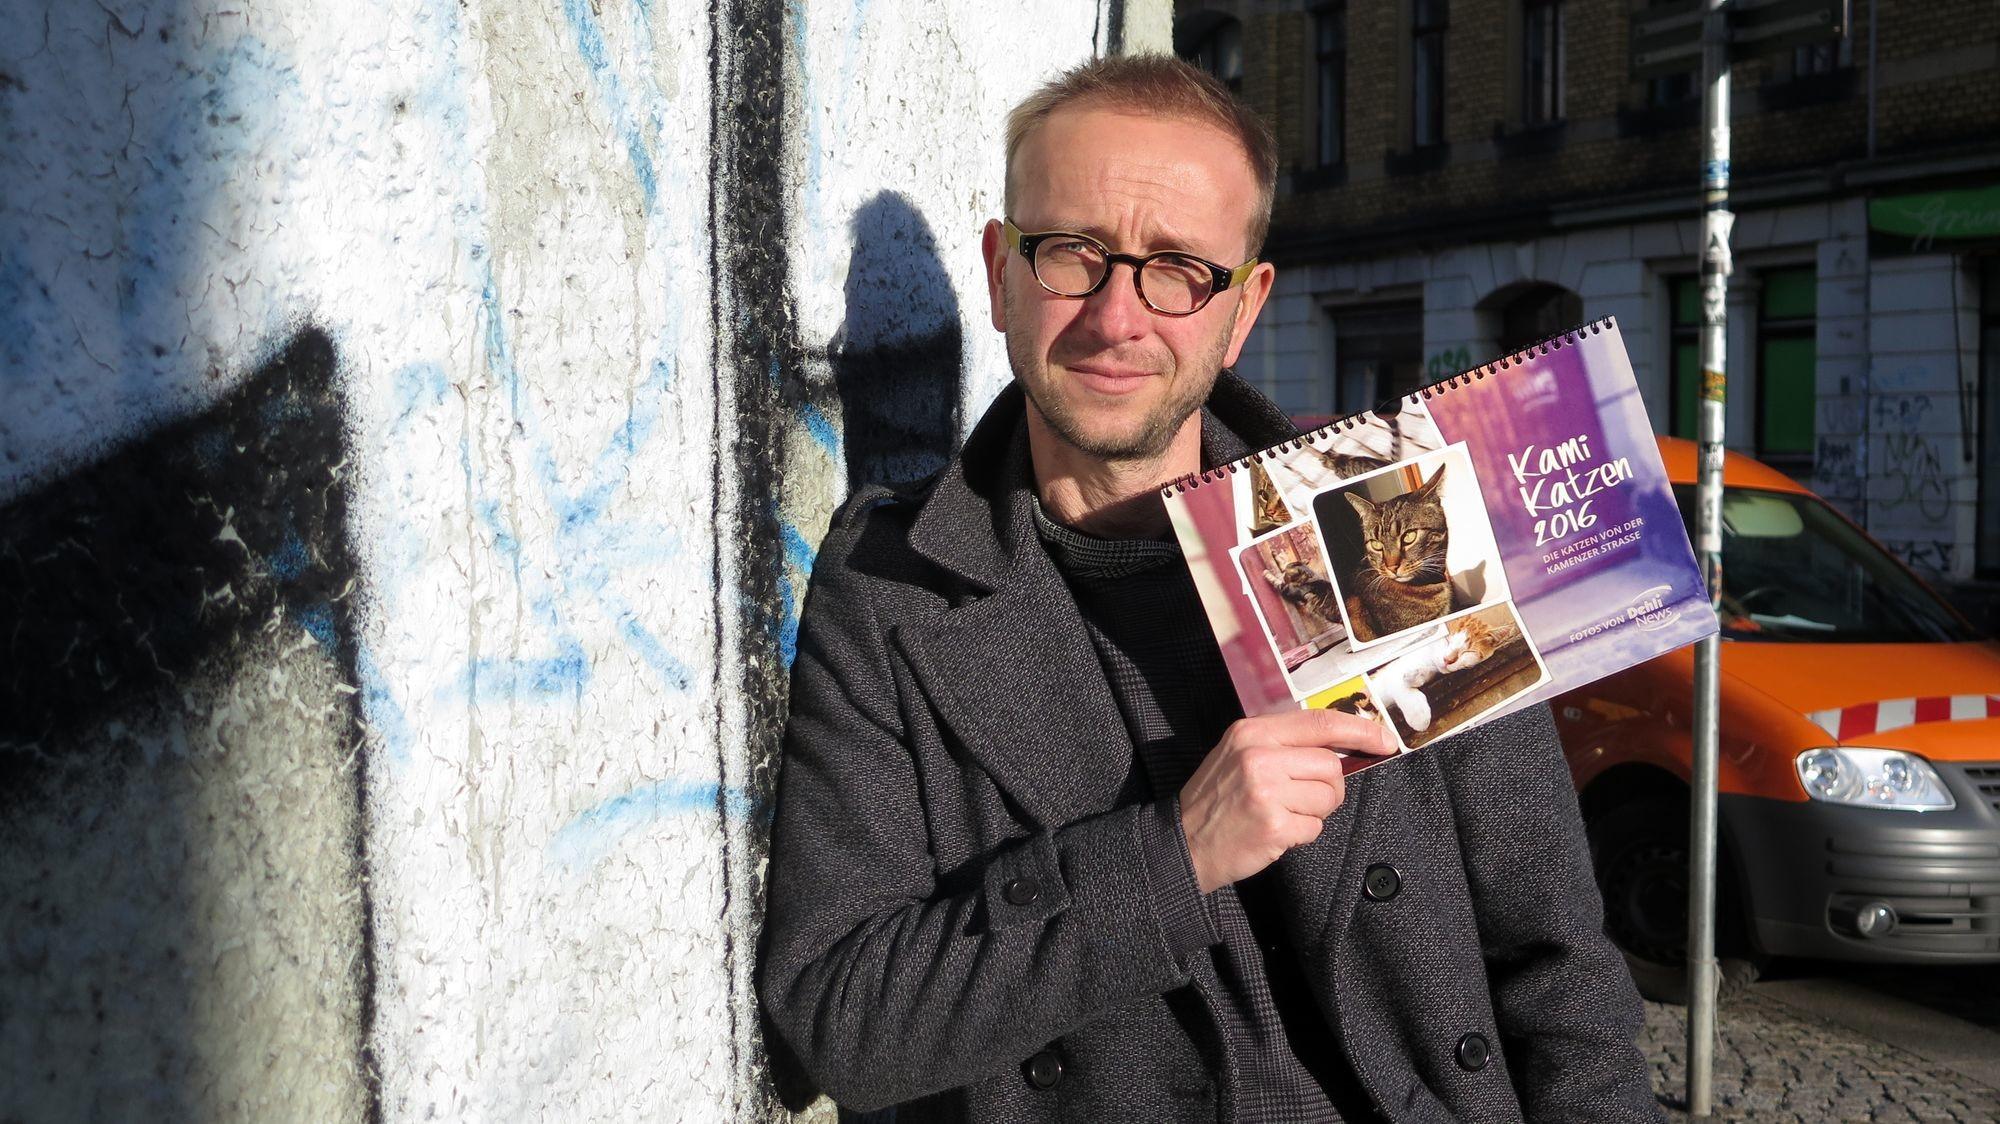 Fotograf Dehlis mit Katzenkalender